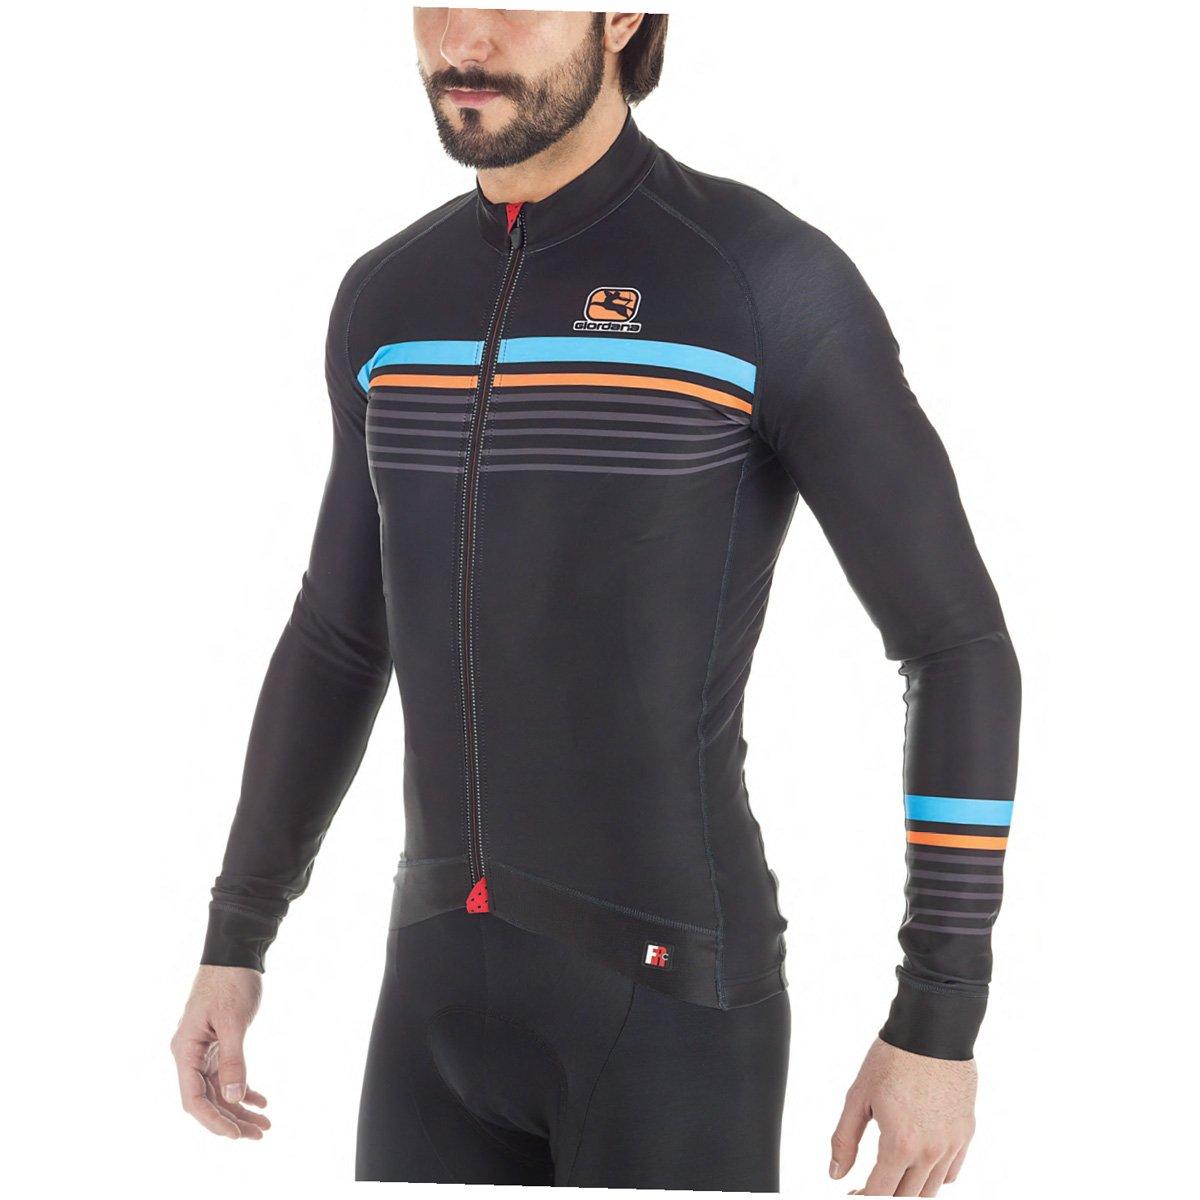 Giordana fr-c Sette長袖Jersey – Men 's Medium BLACK/ORAN/BLUE B076DXF92N